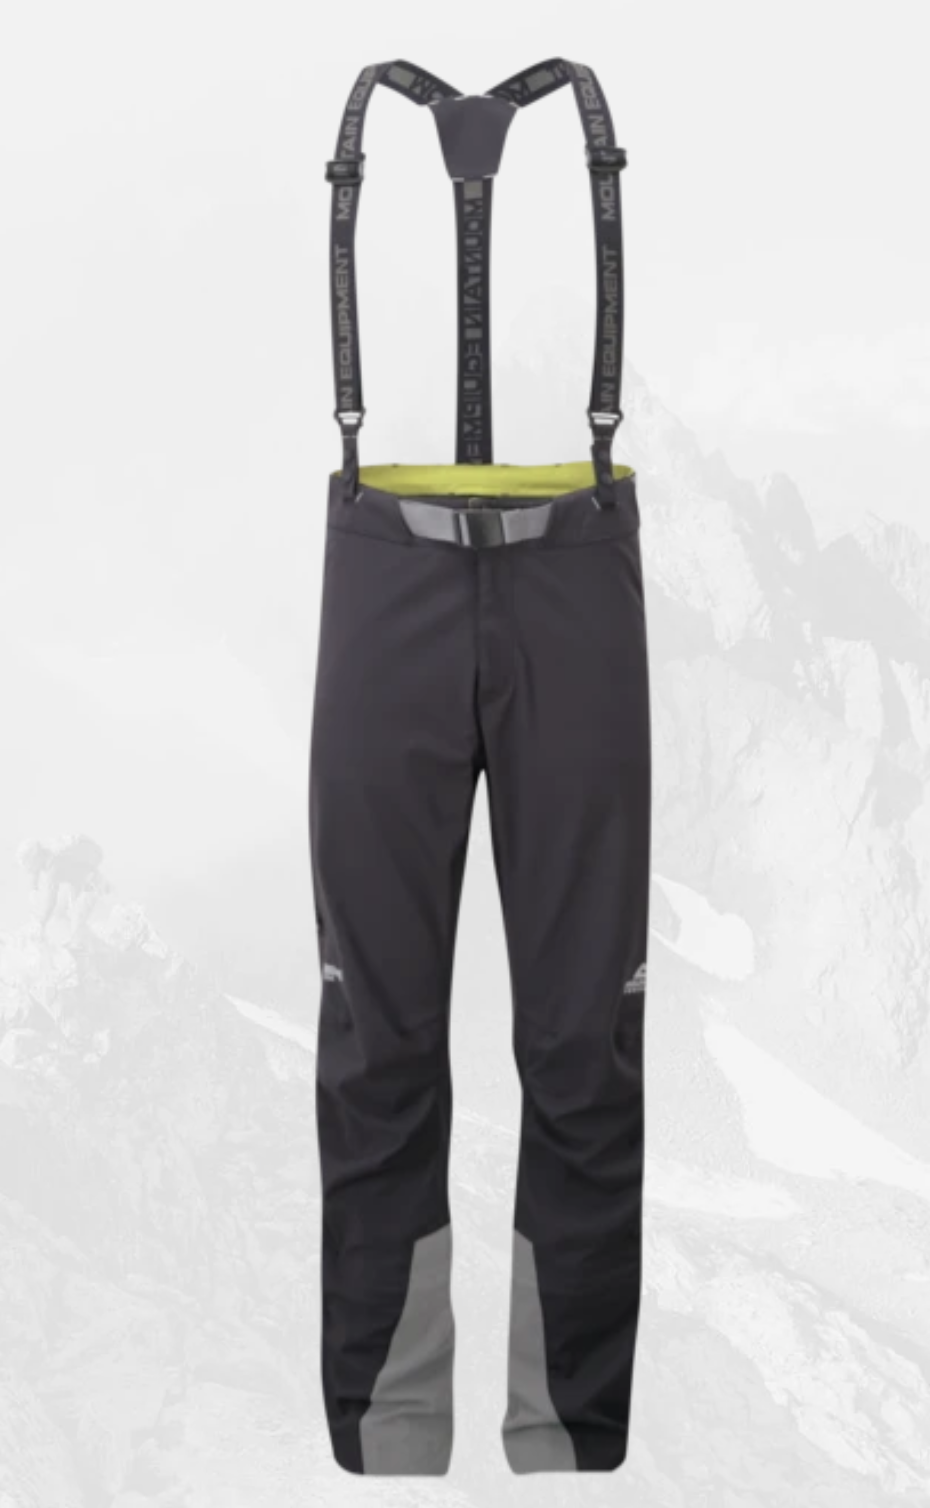 G2 Mountain Pant